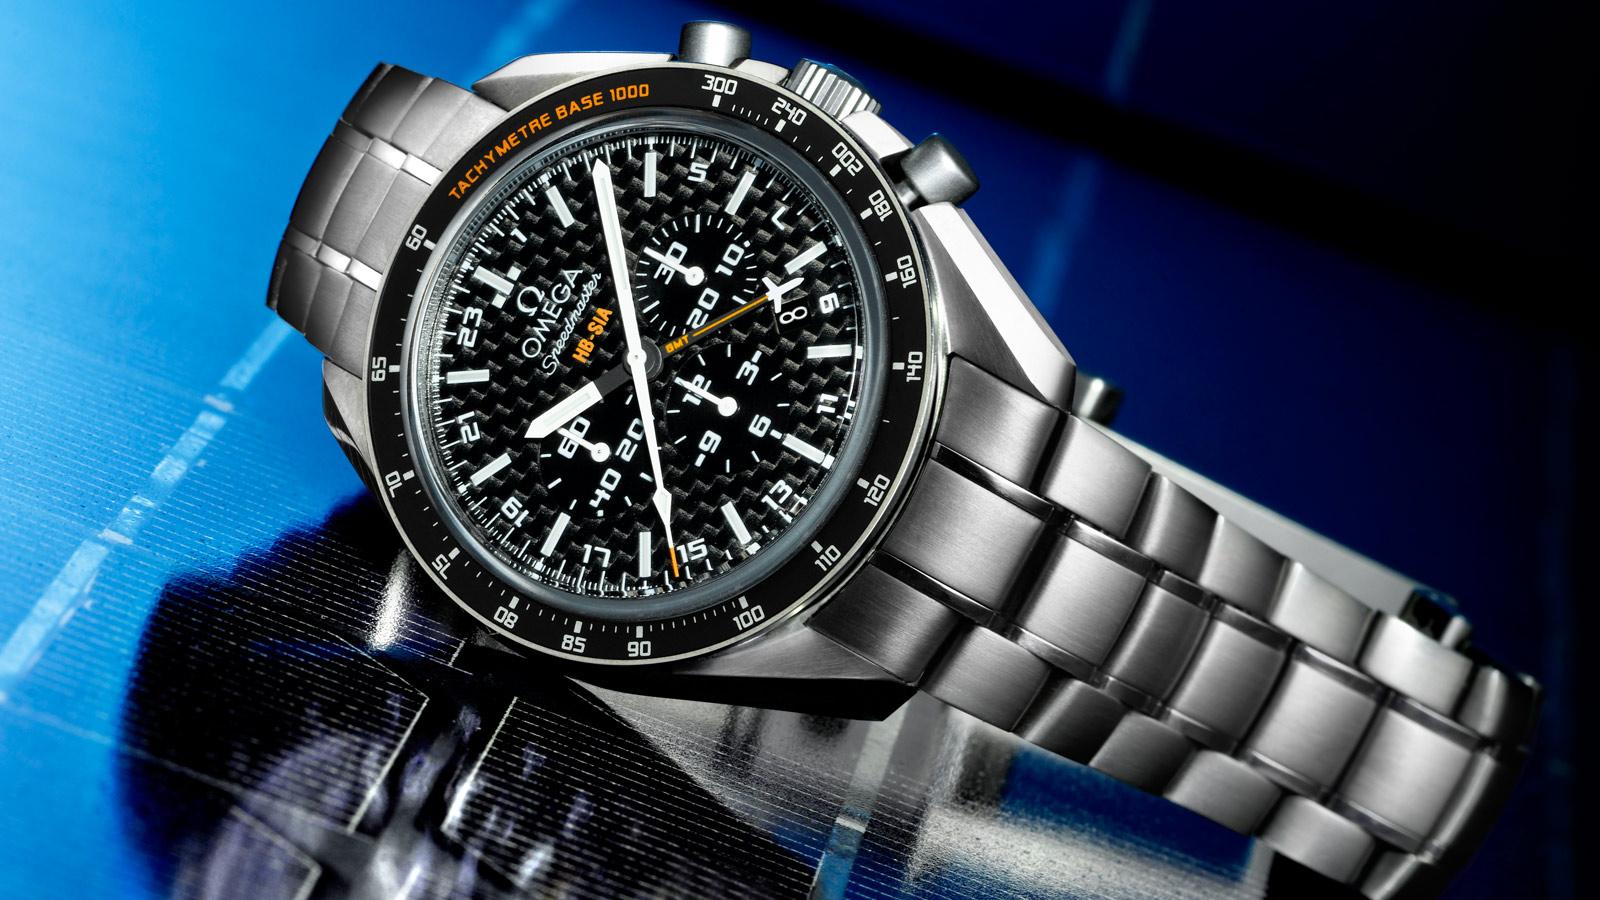 Speedmaster SOLAR IMPULSE HB‑SIA腕表 HB‑SIA腕表 44.25毫米同轴GMT 编号版计时表 - 321.90.44.52.01.001 - 查看 1